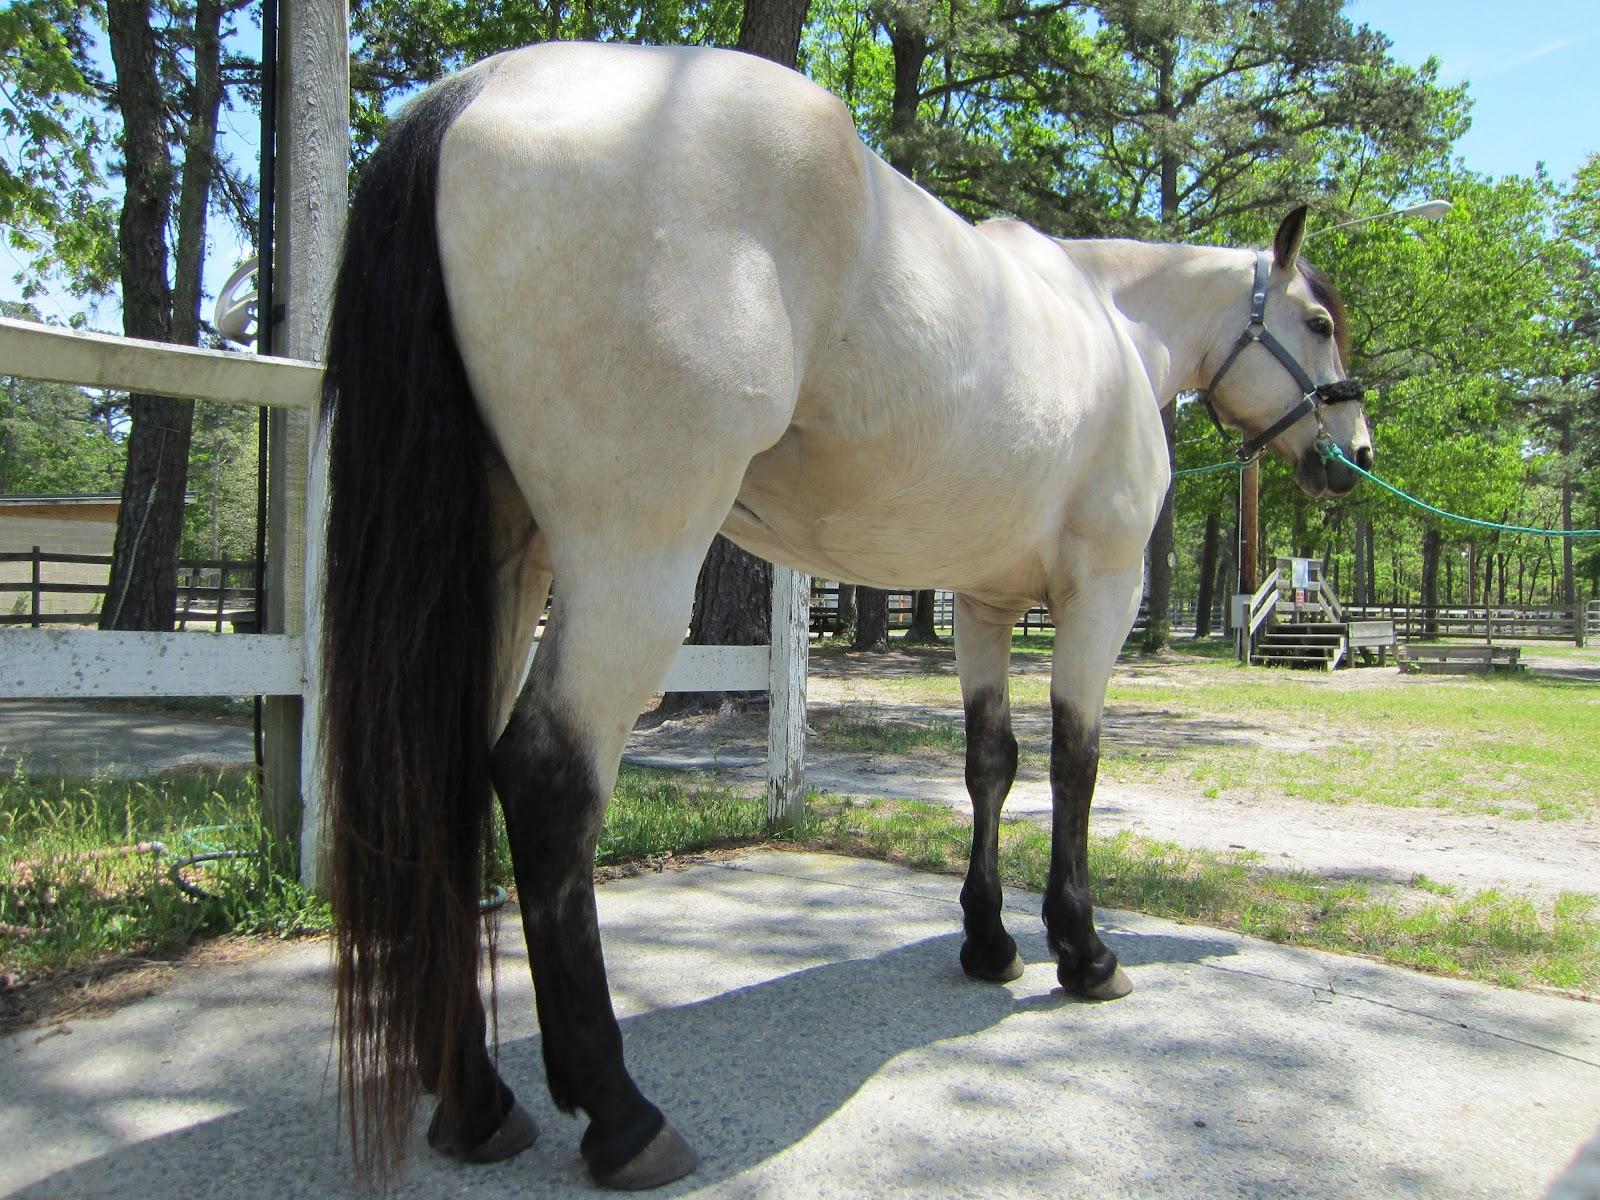 Buckskin Sofa Poundex Bobkona 3 Piece Bonded Leather Sectional Cream Memoirs Of A Horse Girl: Buttermilk Buckskin: Changing Colors